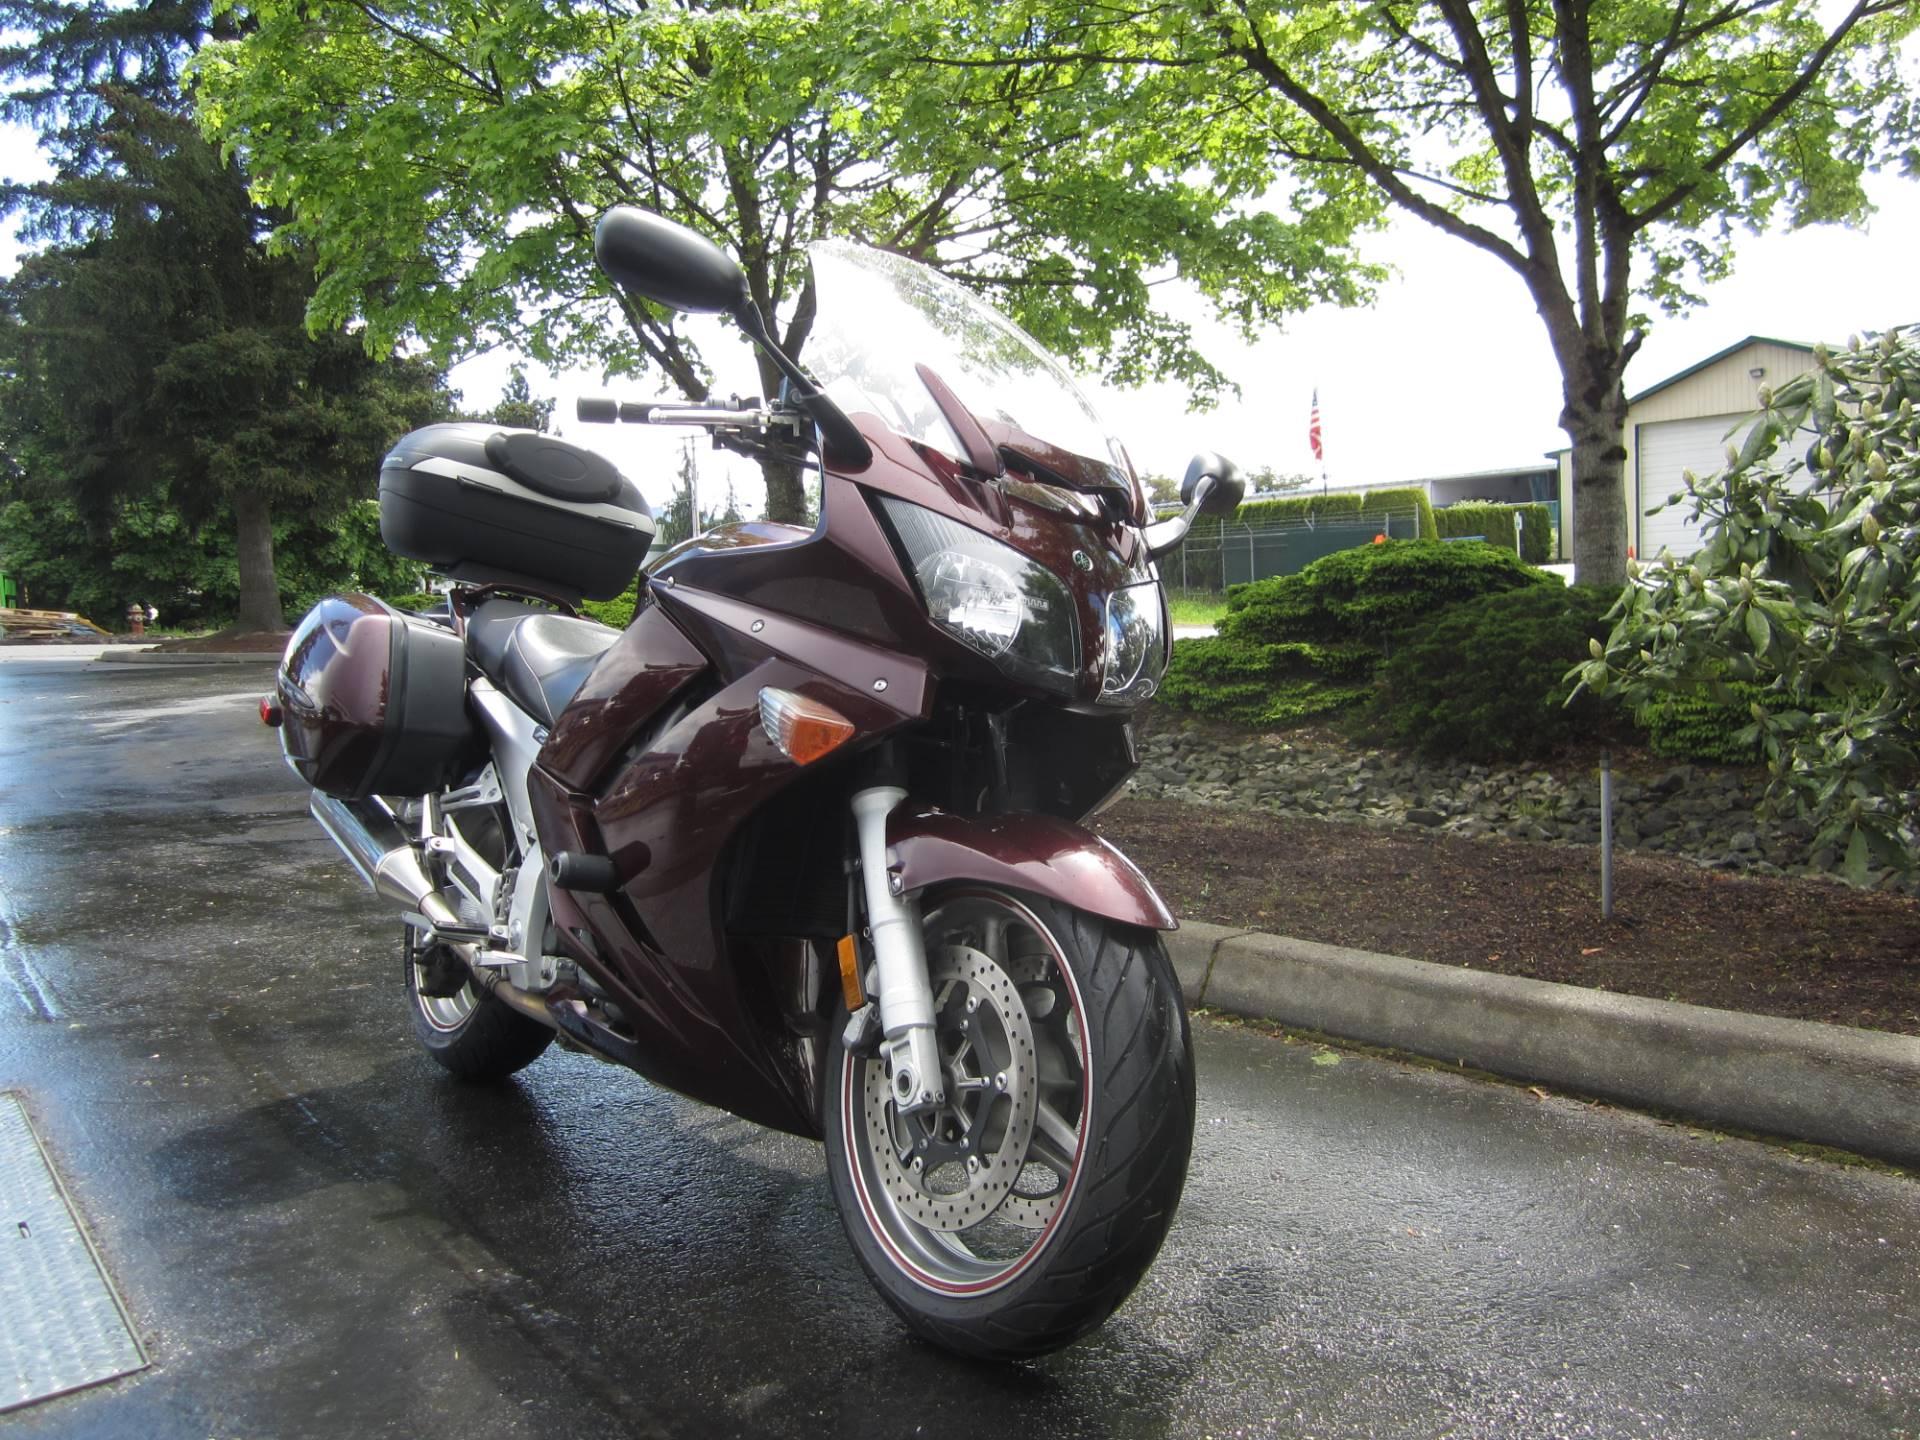 2007 Yamaha FJR 1300A 4